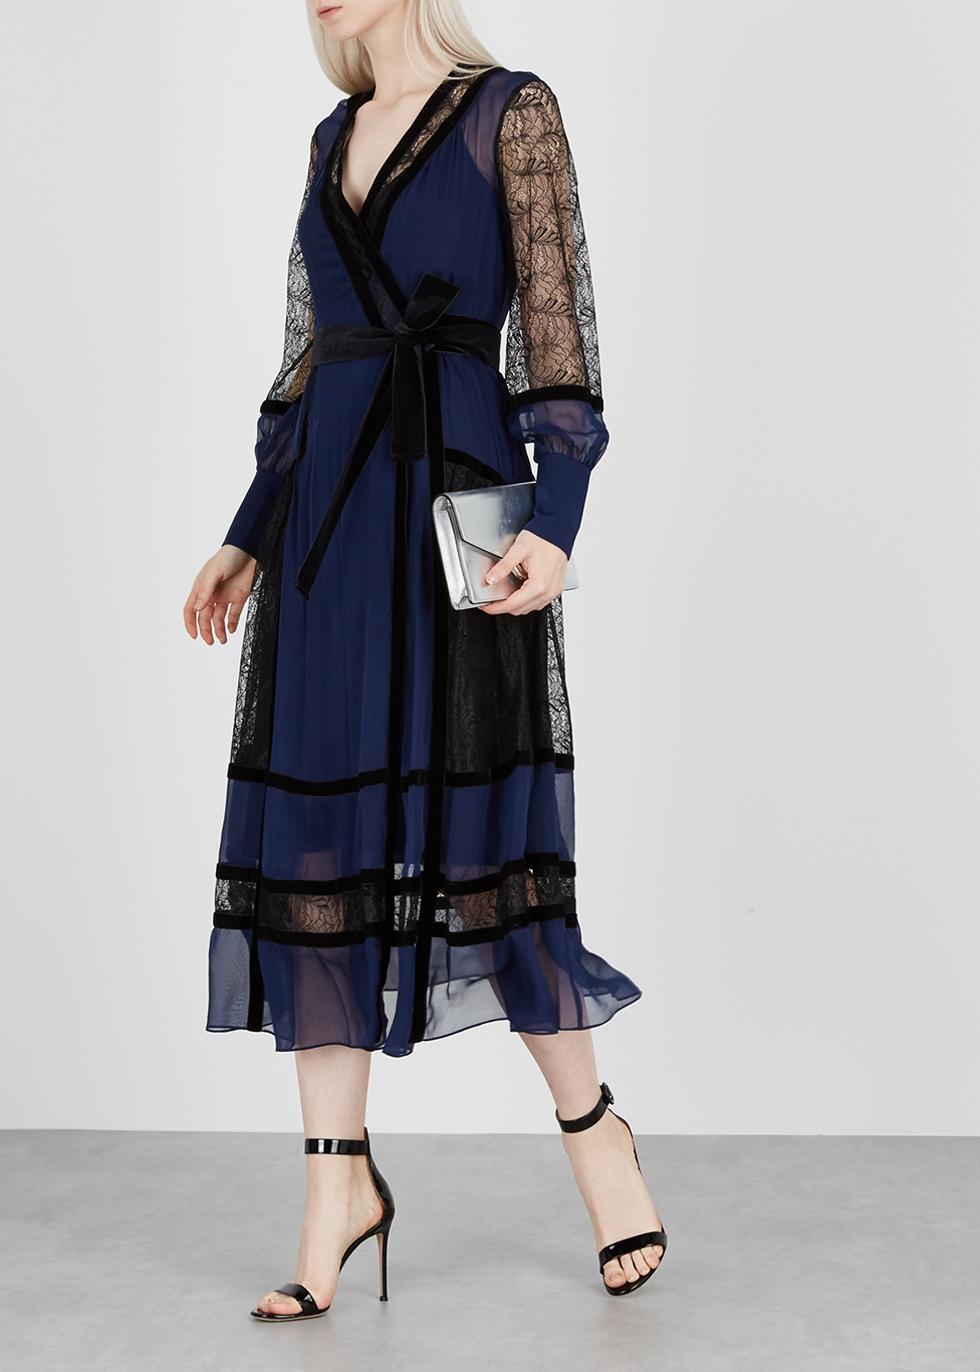 ac97d2d255e73 Diane von Furstenberg Forrest lace and silk chiffon midi dress - Harvey  Nichols